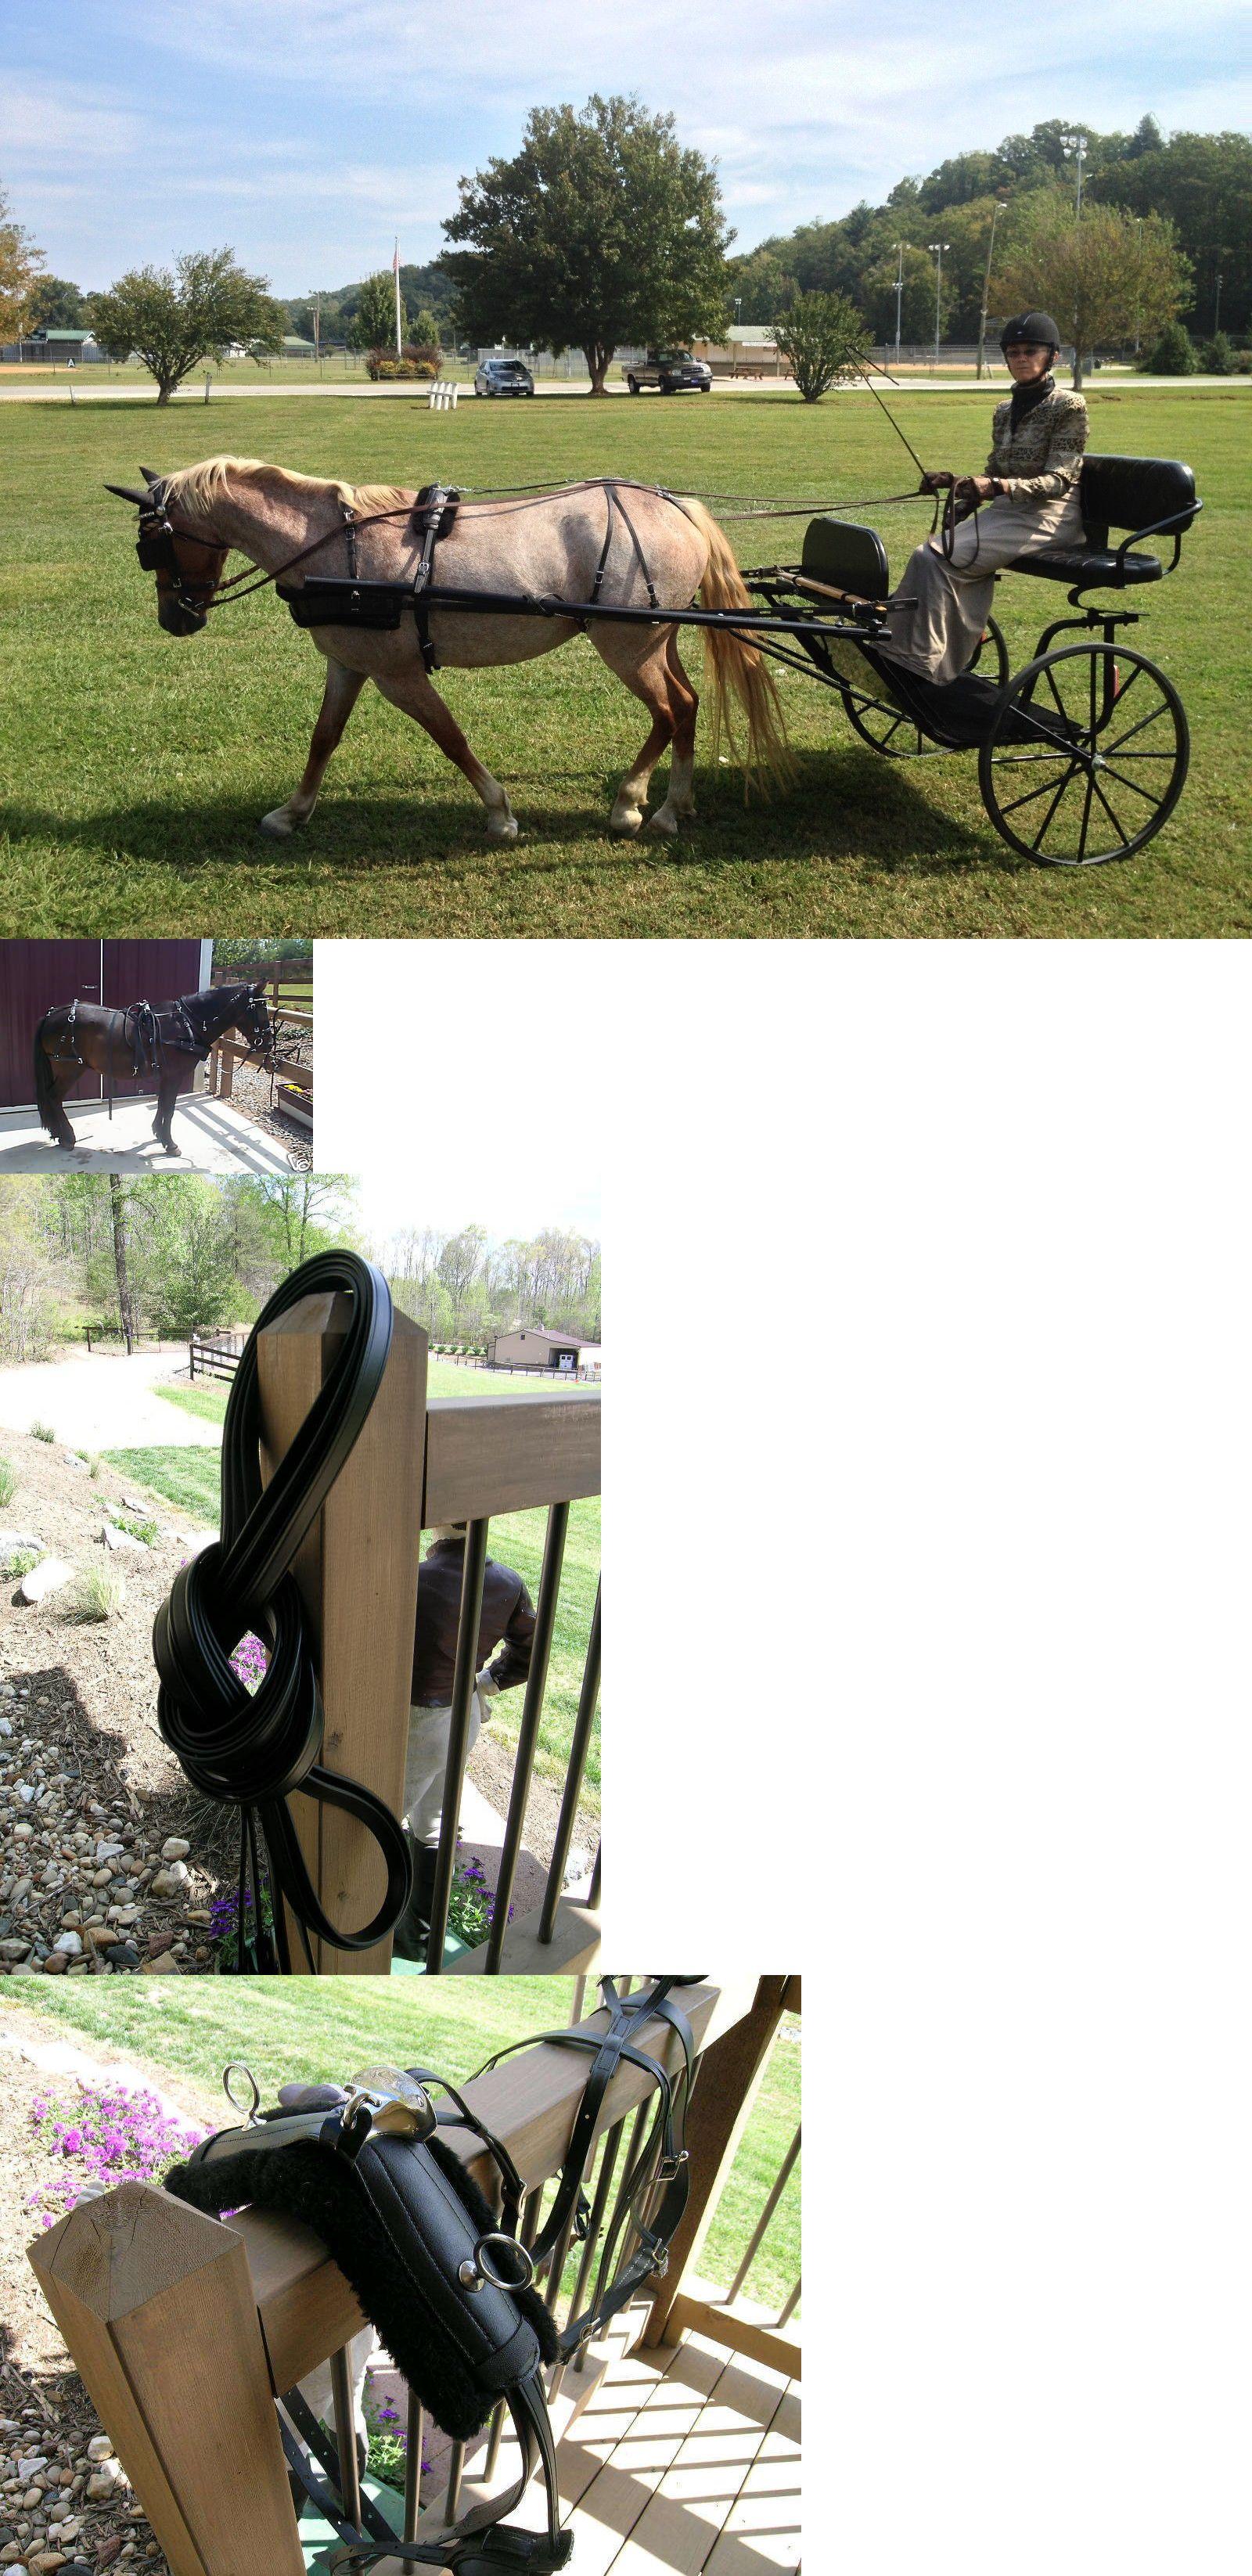 medium resolution of driving equipment 85178 biothane large pony harness stainless hardware new